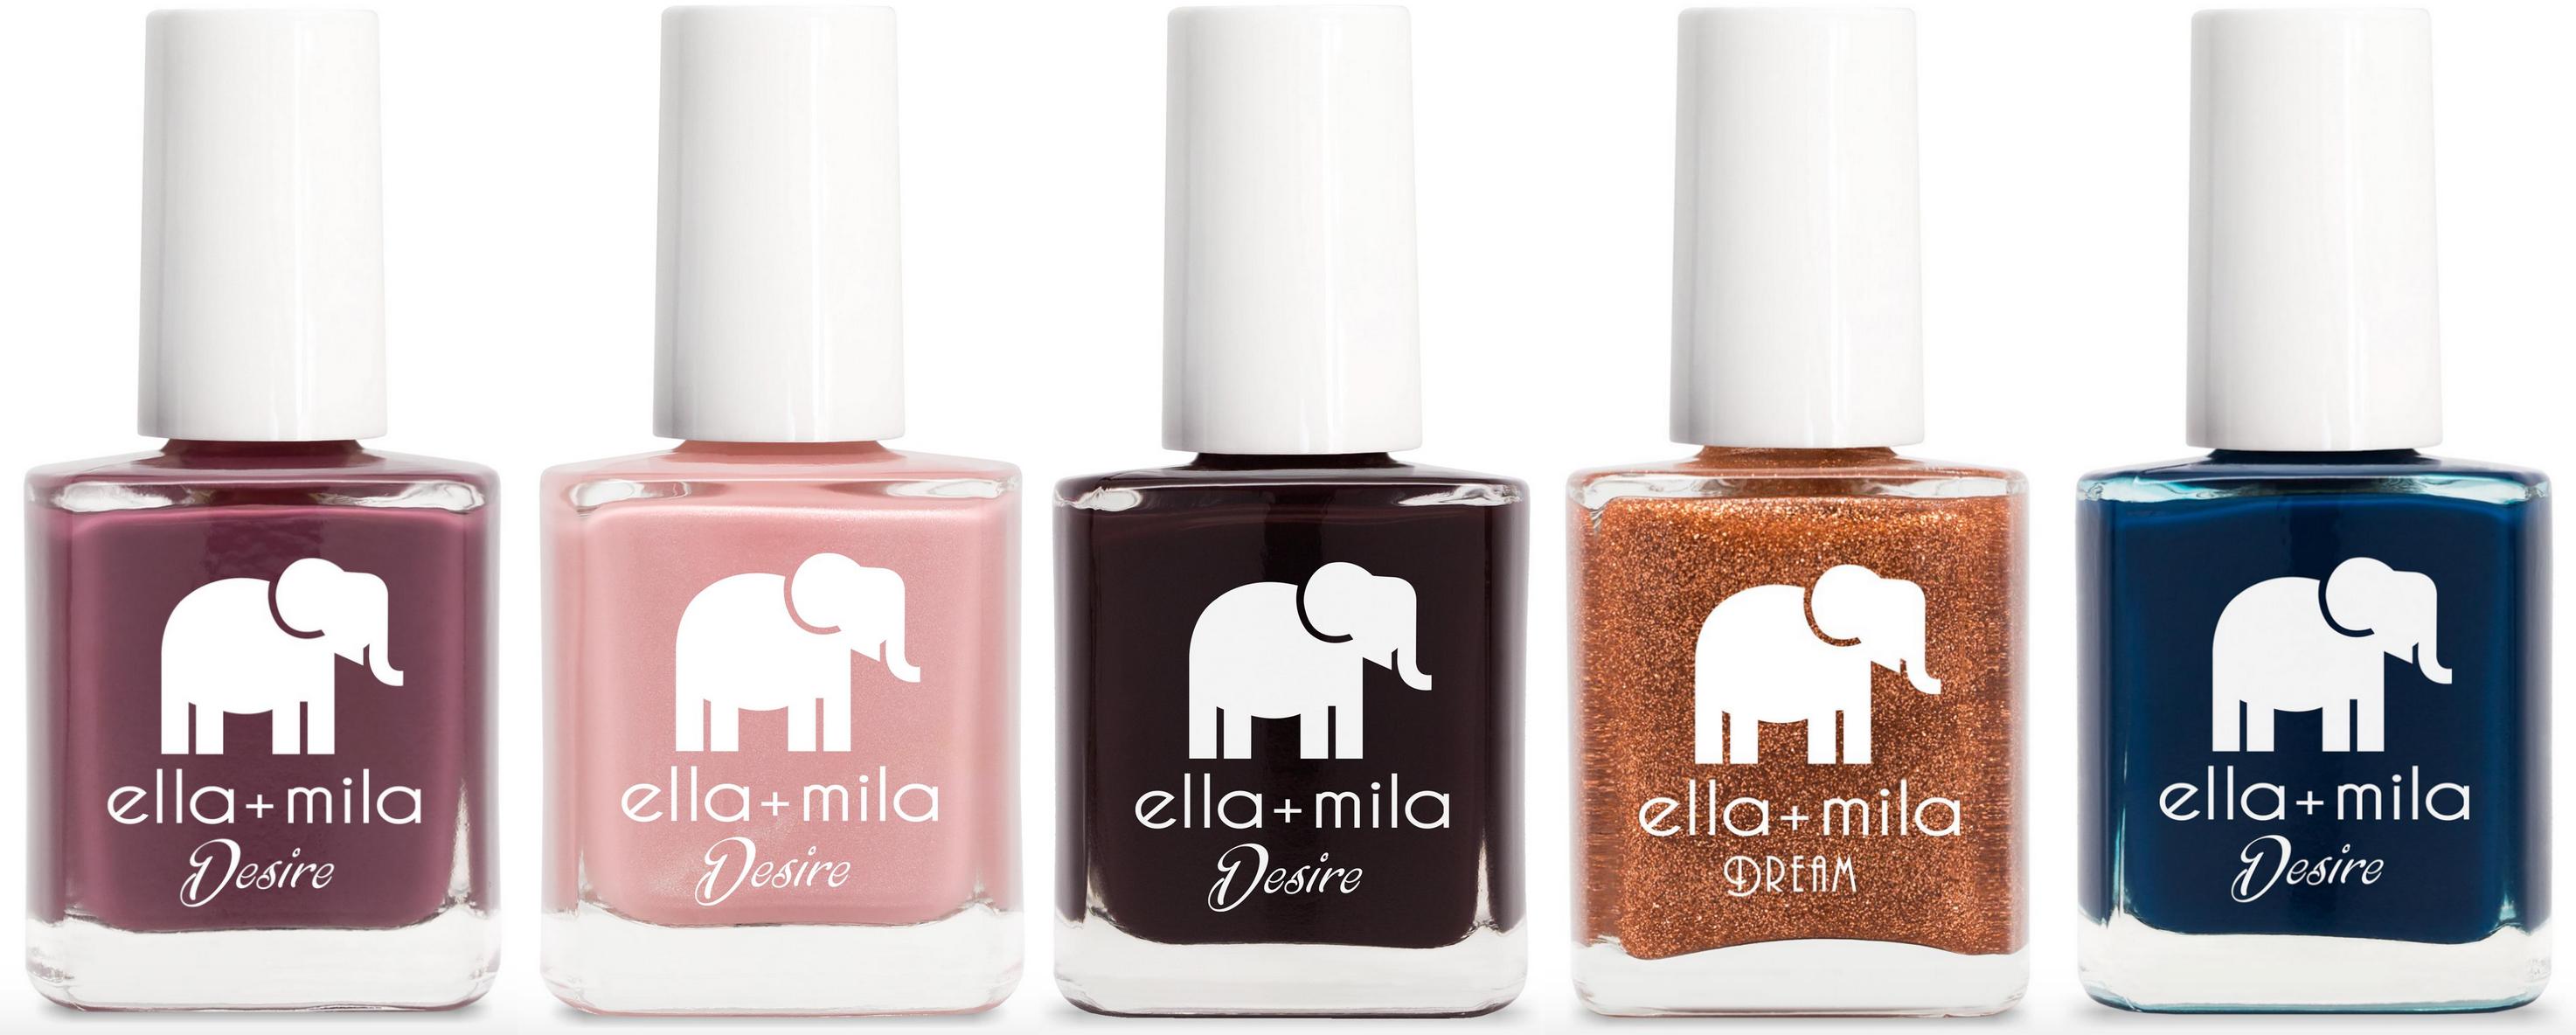 Use our Ella+Mila promo code to score Ella + Mila Fall Colors 40% off